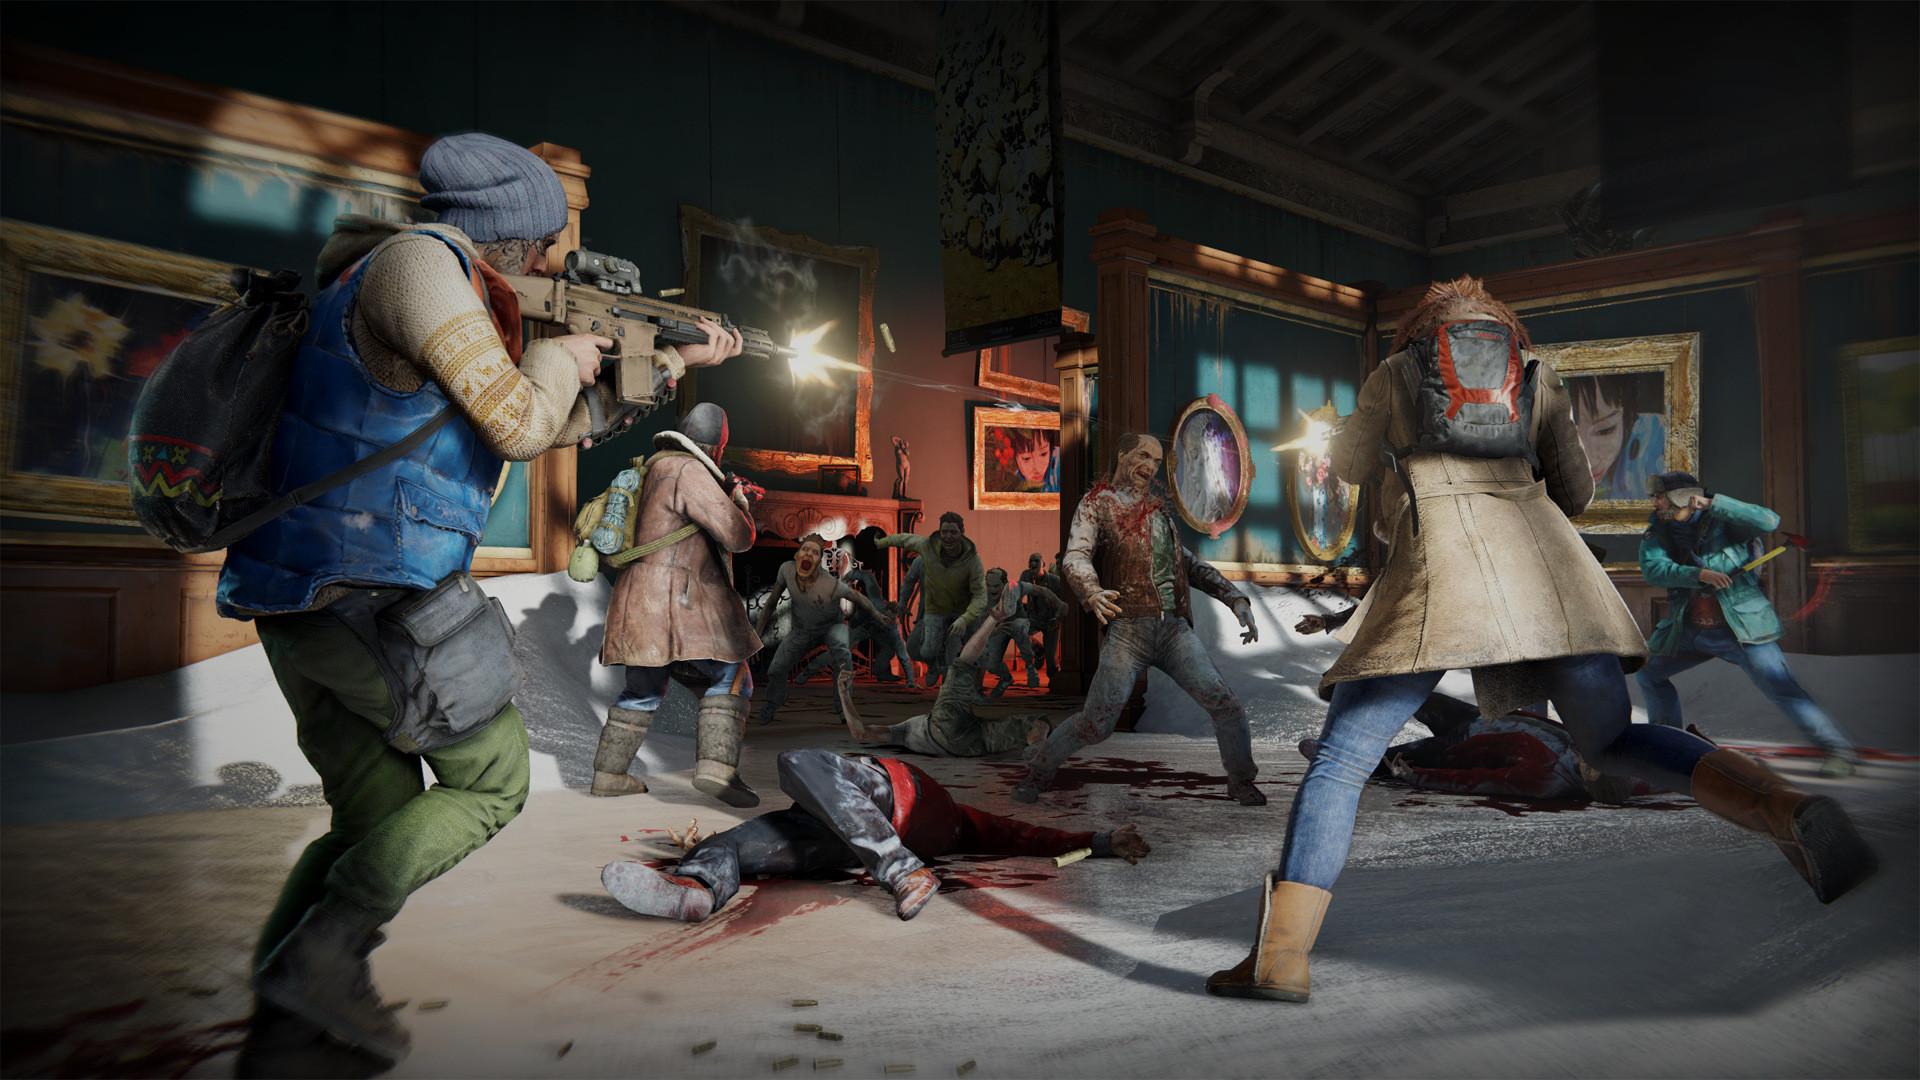 Зомби захватывают Москву на новых скриншотах экшена World War Z